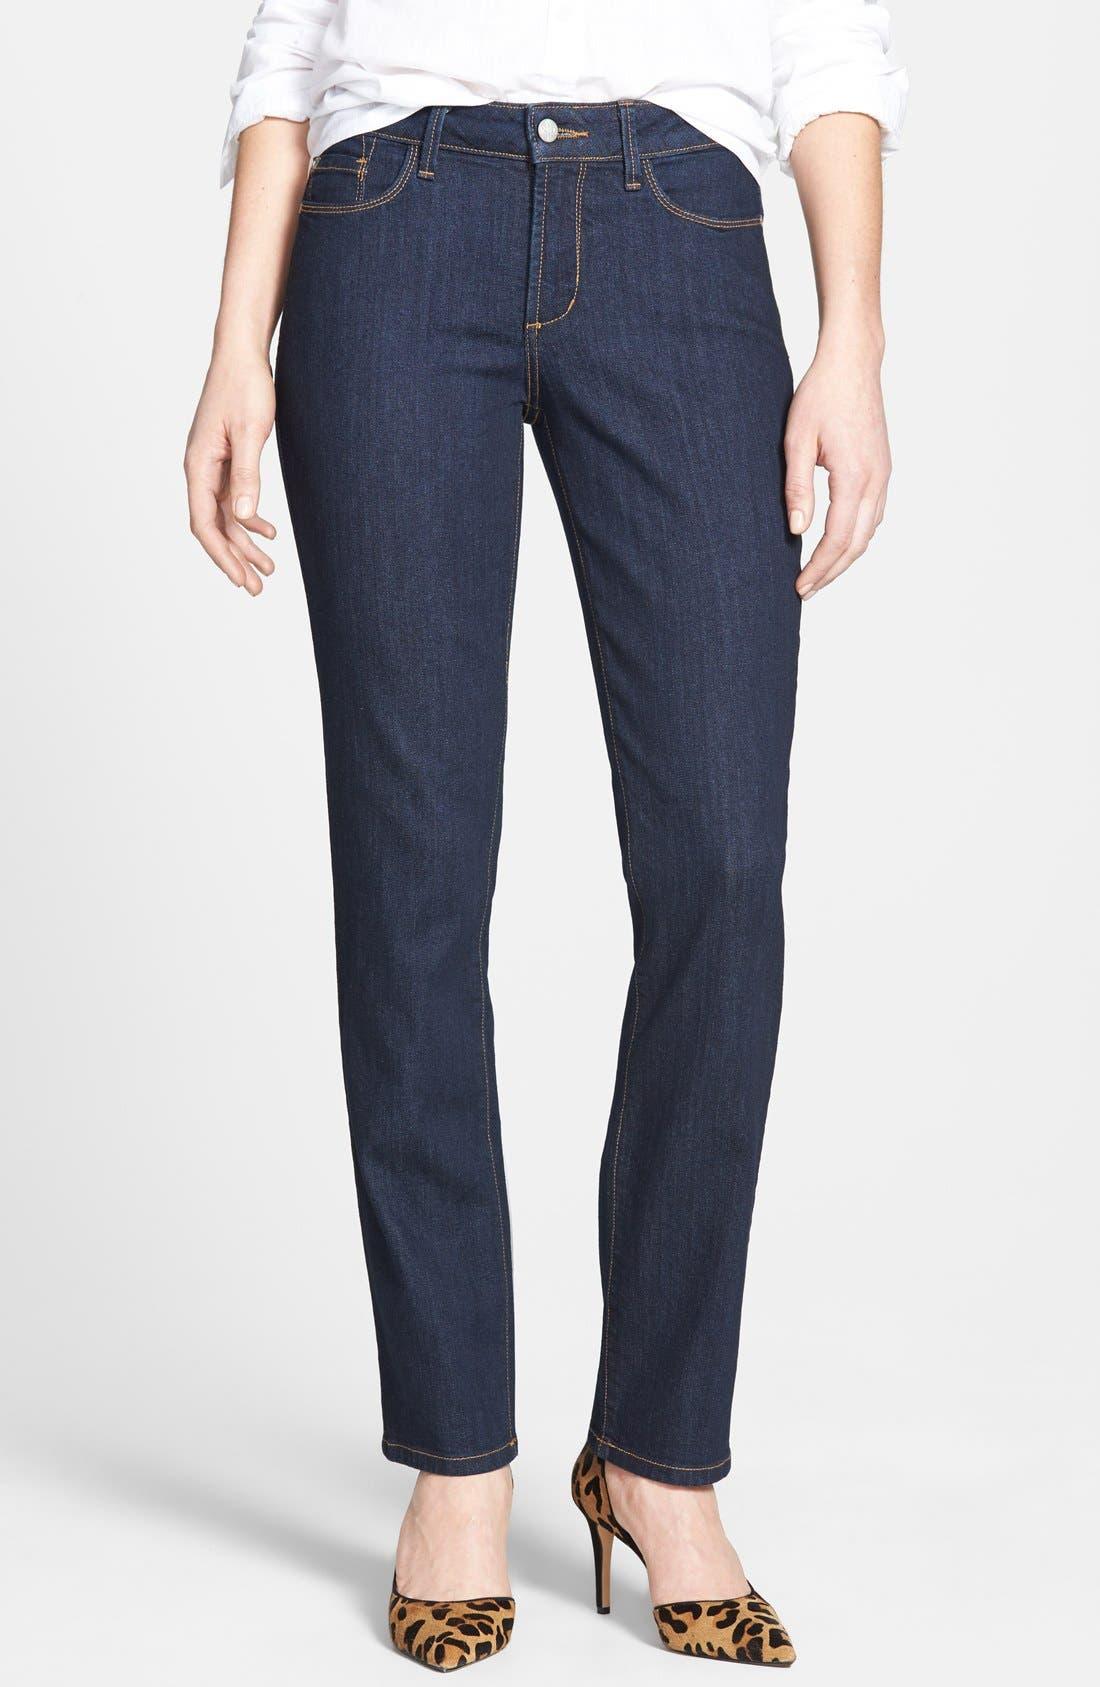 Alternate Image 1 Selected - NYDJ 'Sheri' Stretch Skinny Jeans (Larchmont) (Online Only)